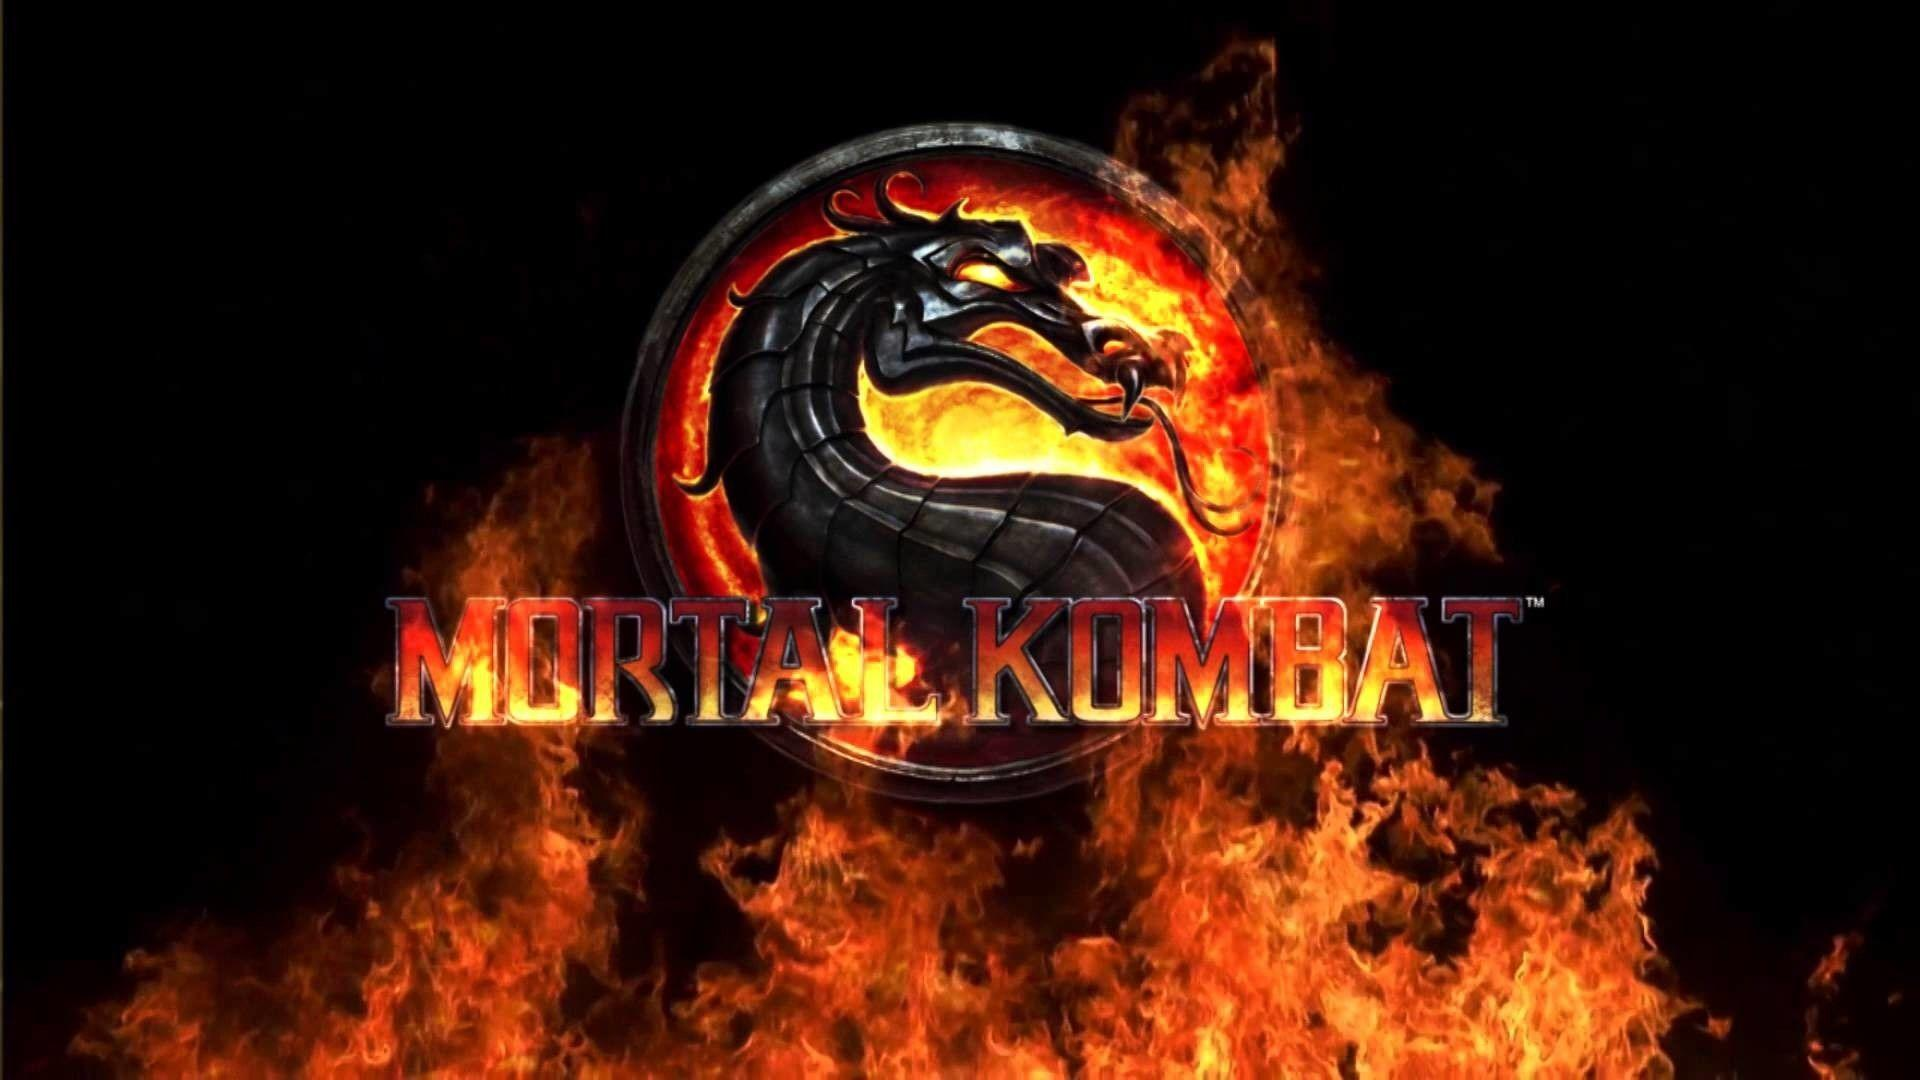 Mortal Kombat Dragon Logo Wallpapers HD - Wallpaper Cave